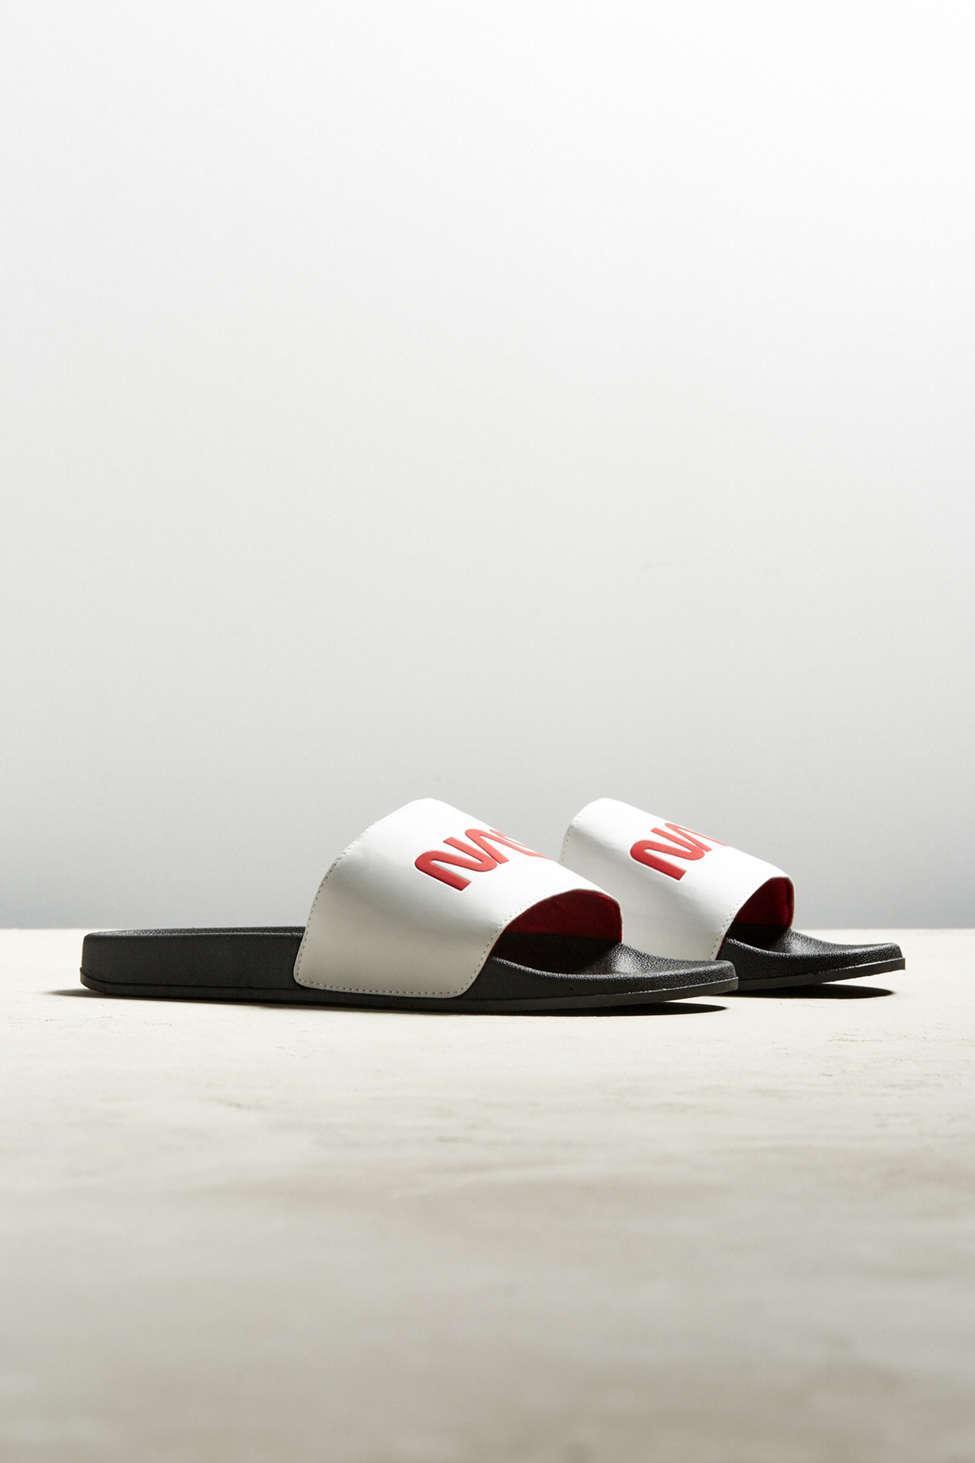 43a5e5e13 Lyst - Urban Outfitters Uo Nasa Slide Sandal in White for Men